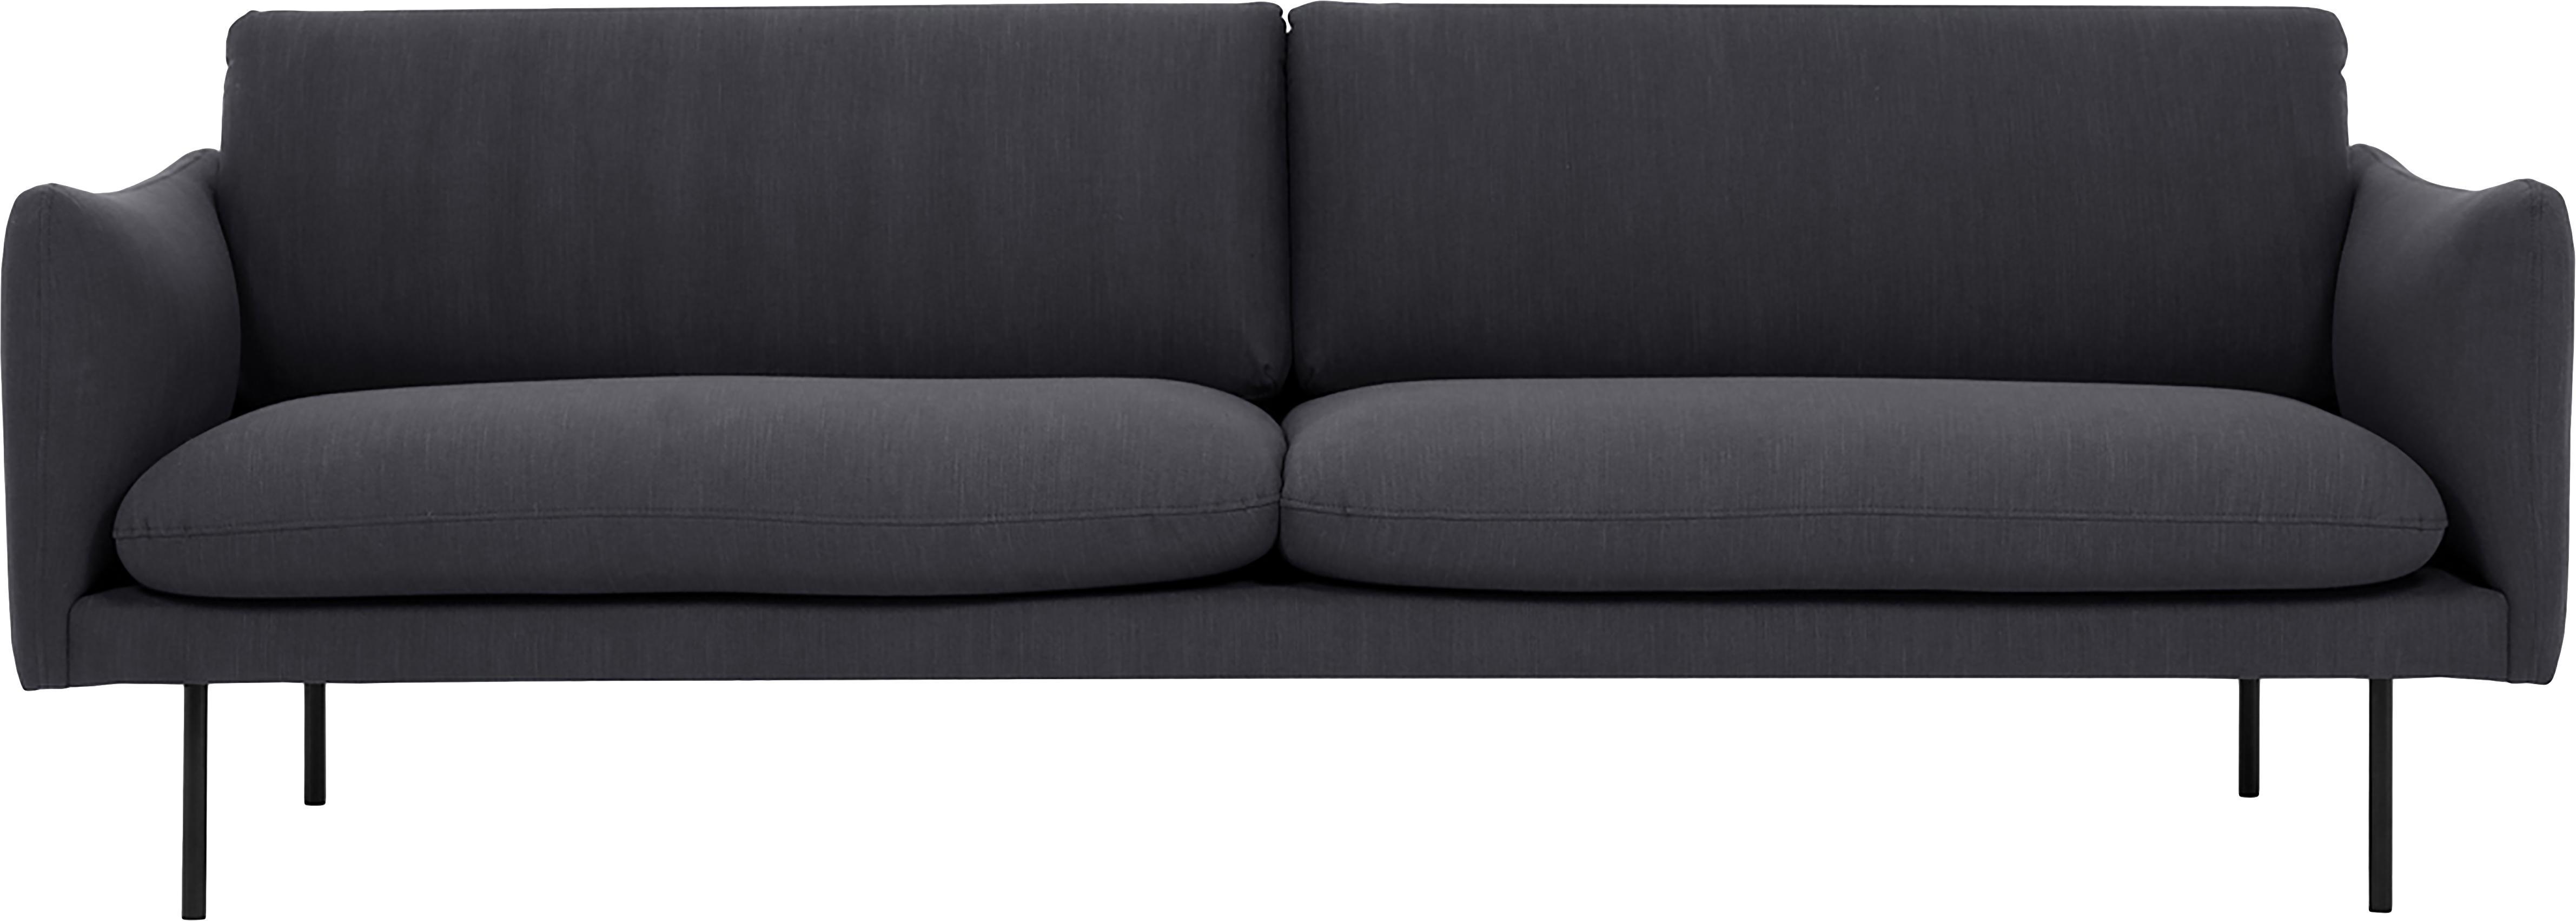 Sofa Moby (3-Sitzer), Bezug: Polyester 60.000 Scheuert, Gestell: Massives Kiefernholz, Webstoff Dunkelgrau, B 220 x T 95 cm